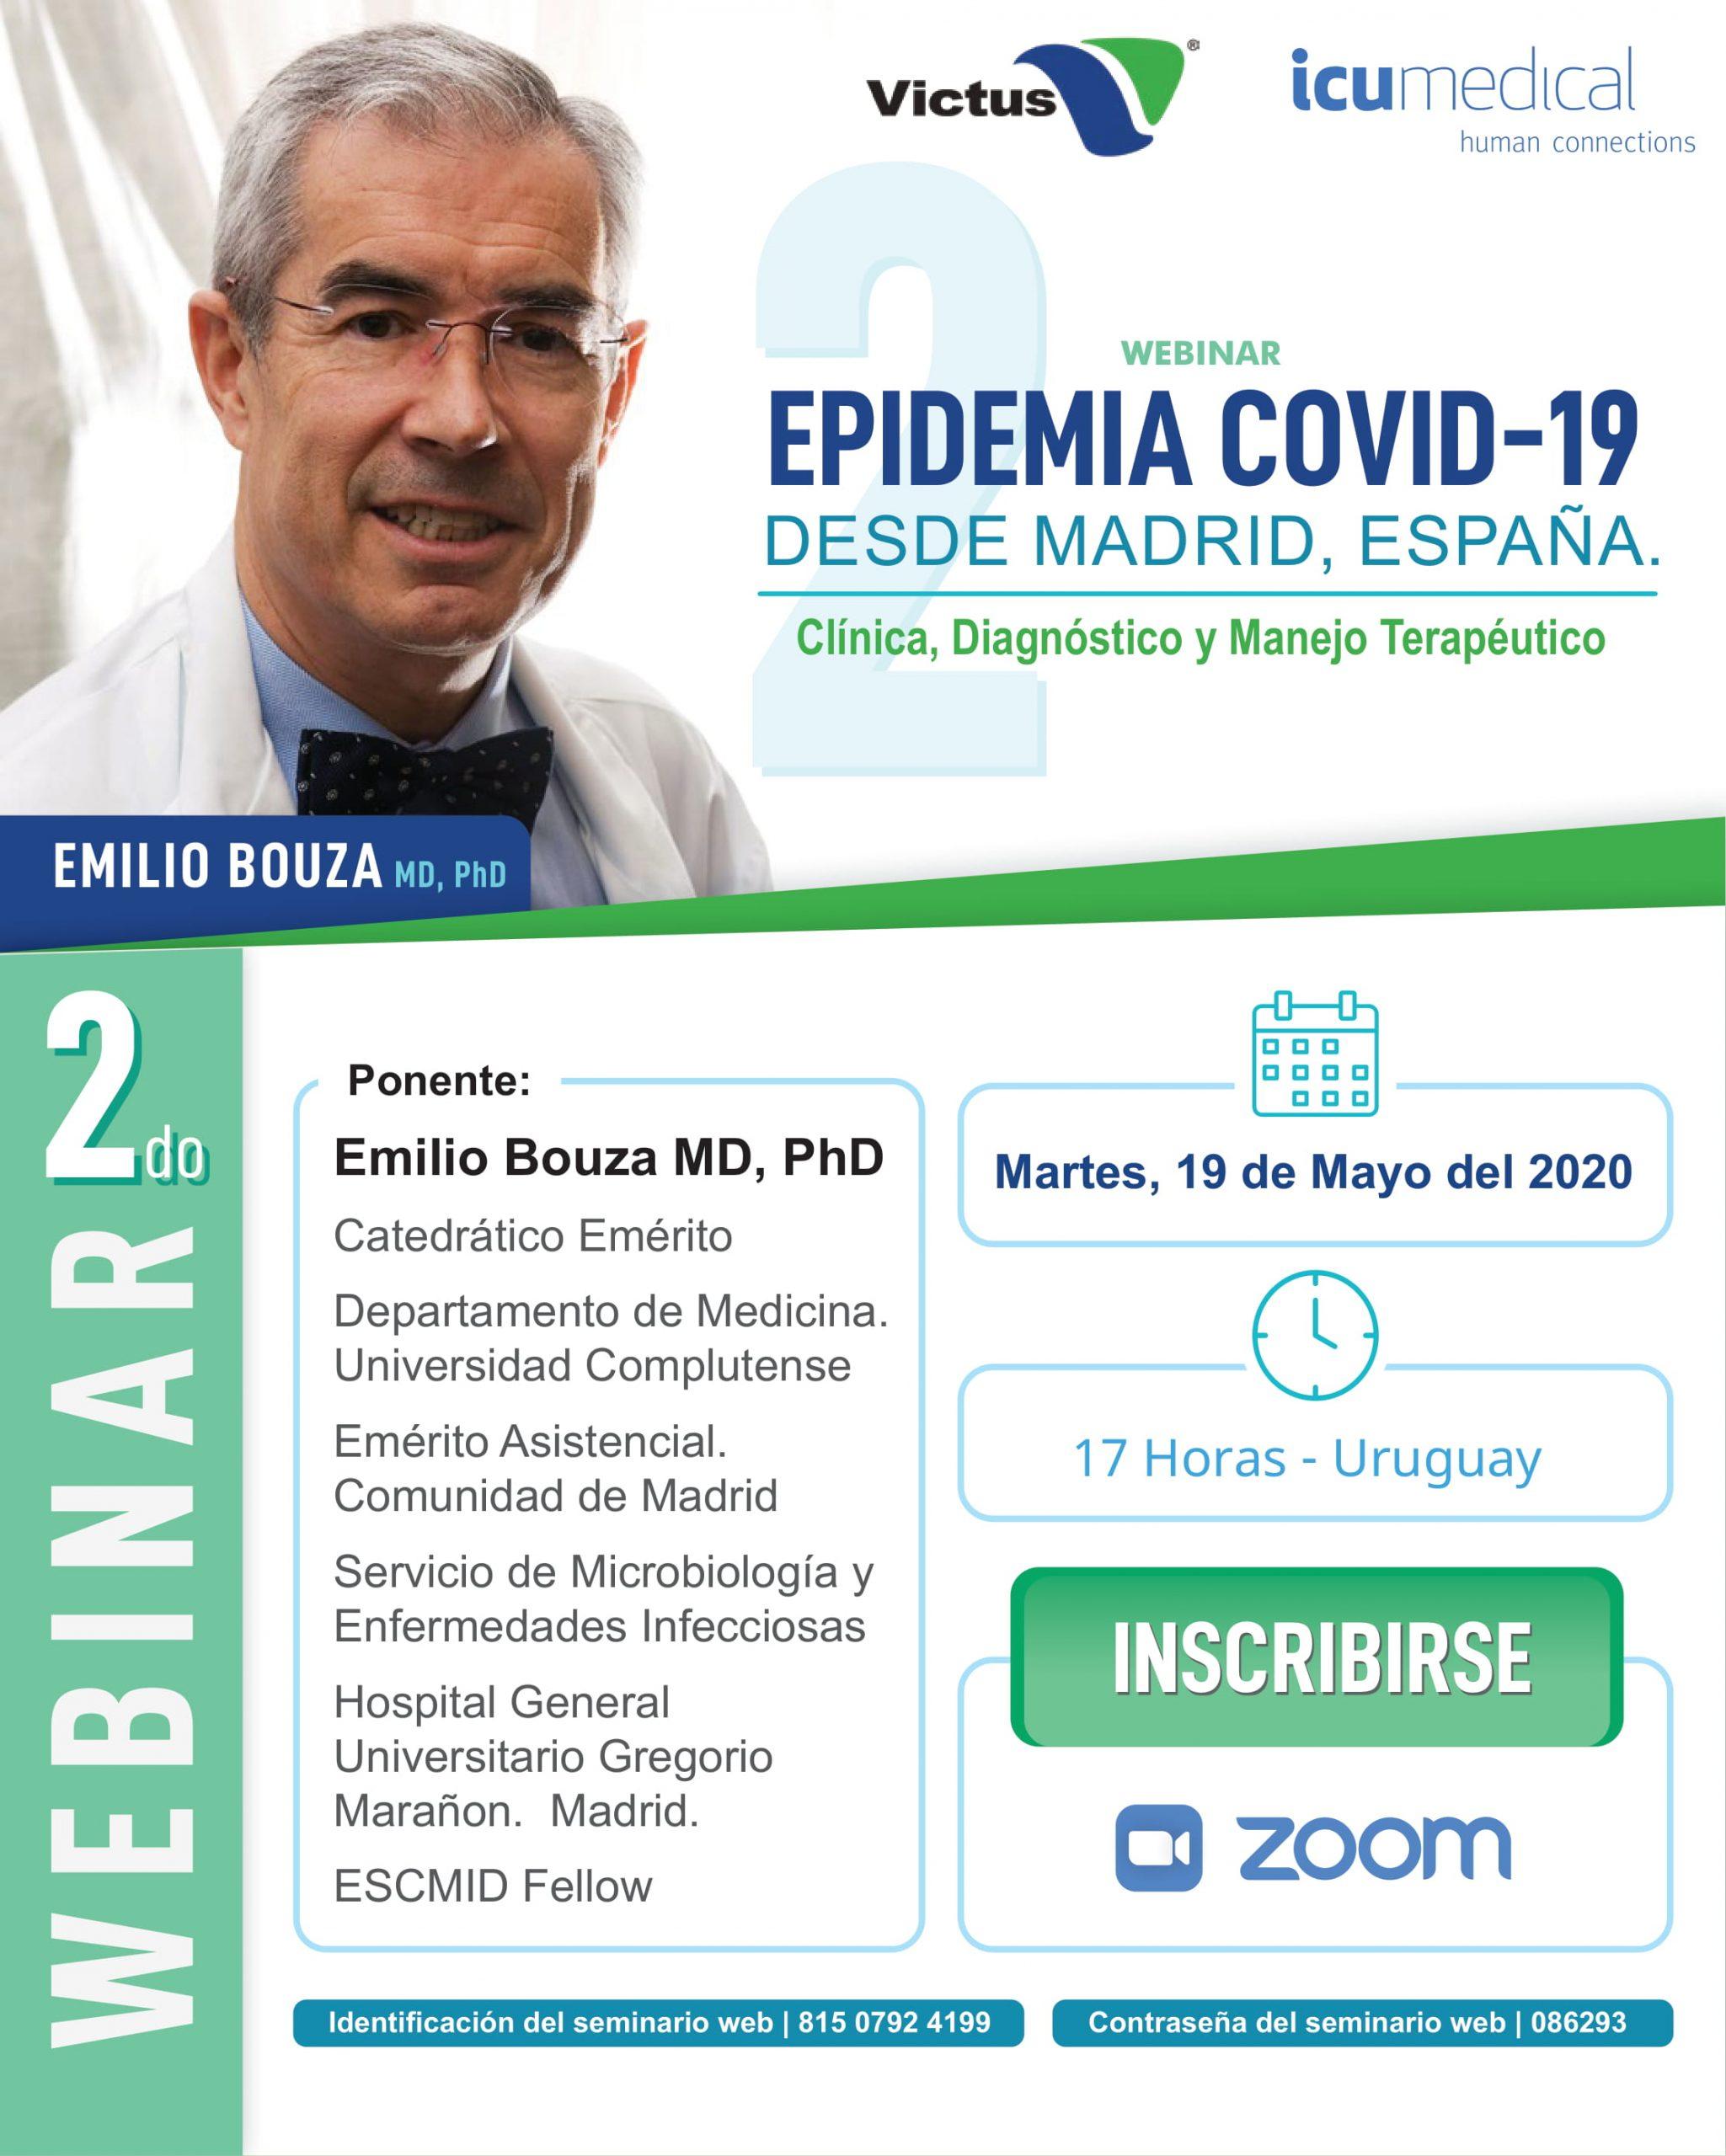 VI SP 0520 125 Rev 01 epidemia covid 19 emilio bouza 2de3 editado 1